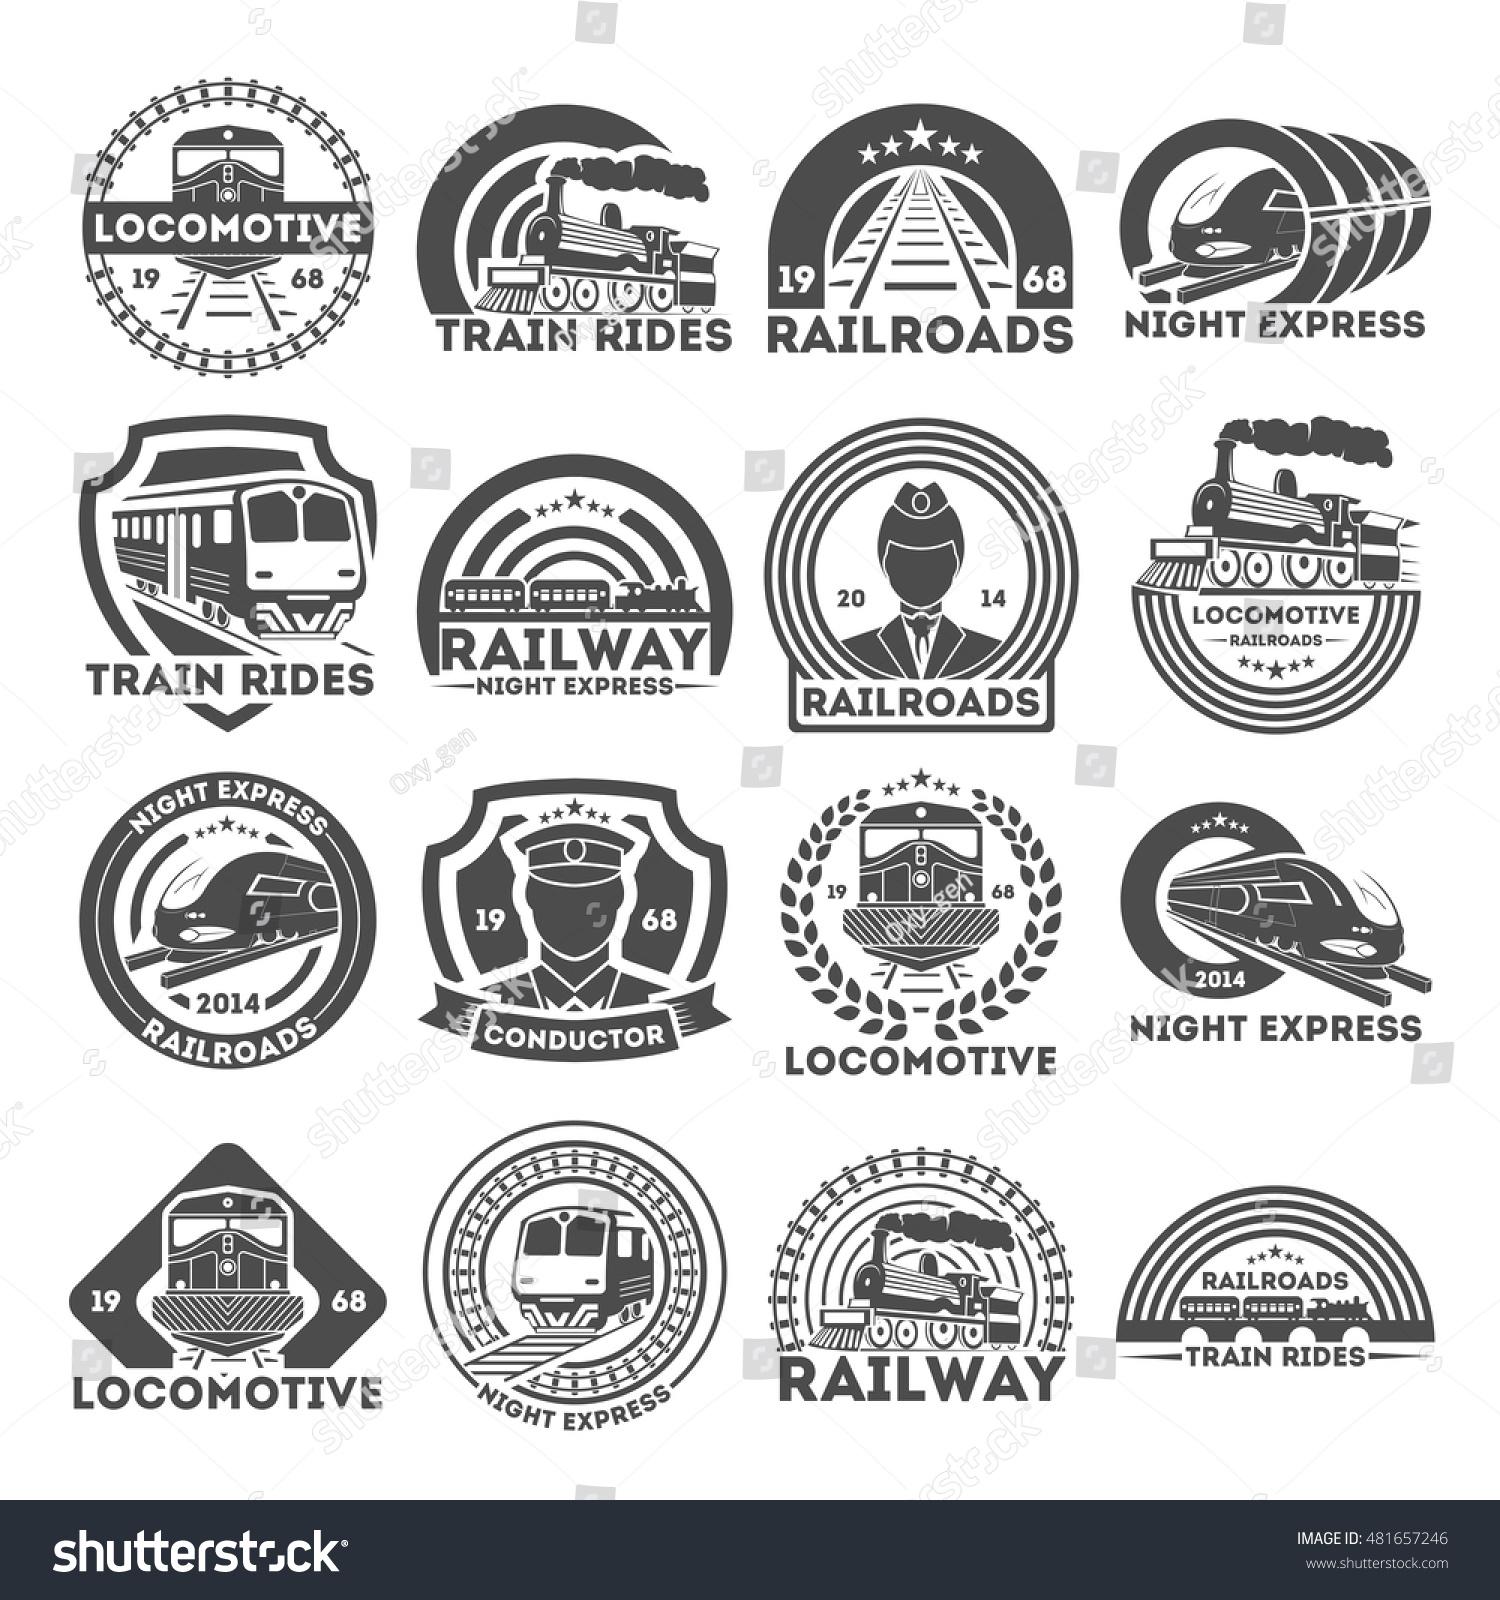 Train railroad logo signs symbols railway stock vector 481657246 train or railroad logo signs and symbols railway train emblems and badges collection biocorpaavc